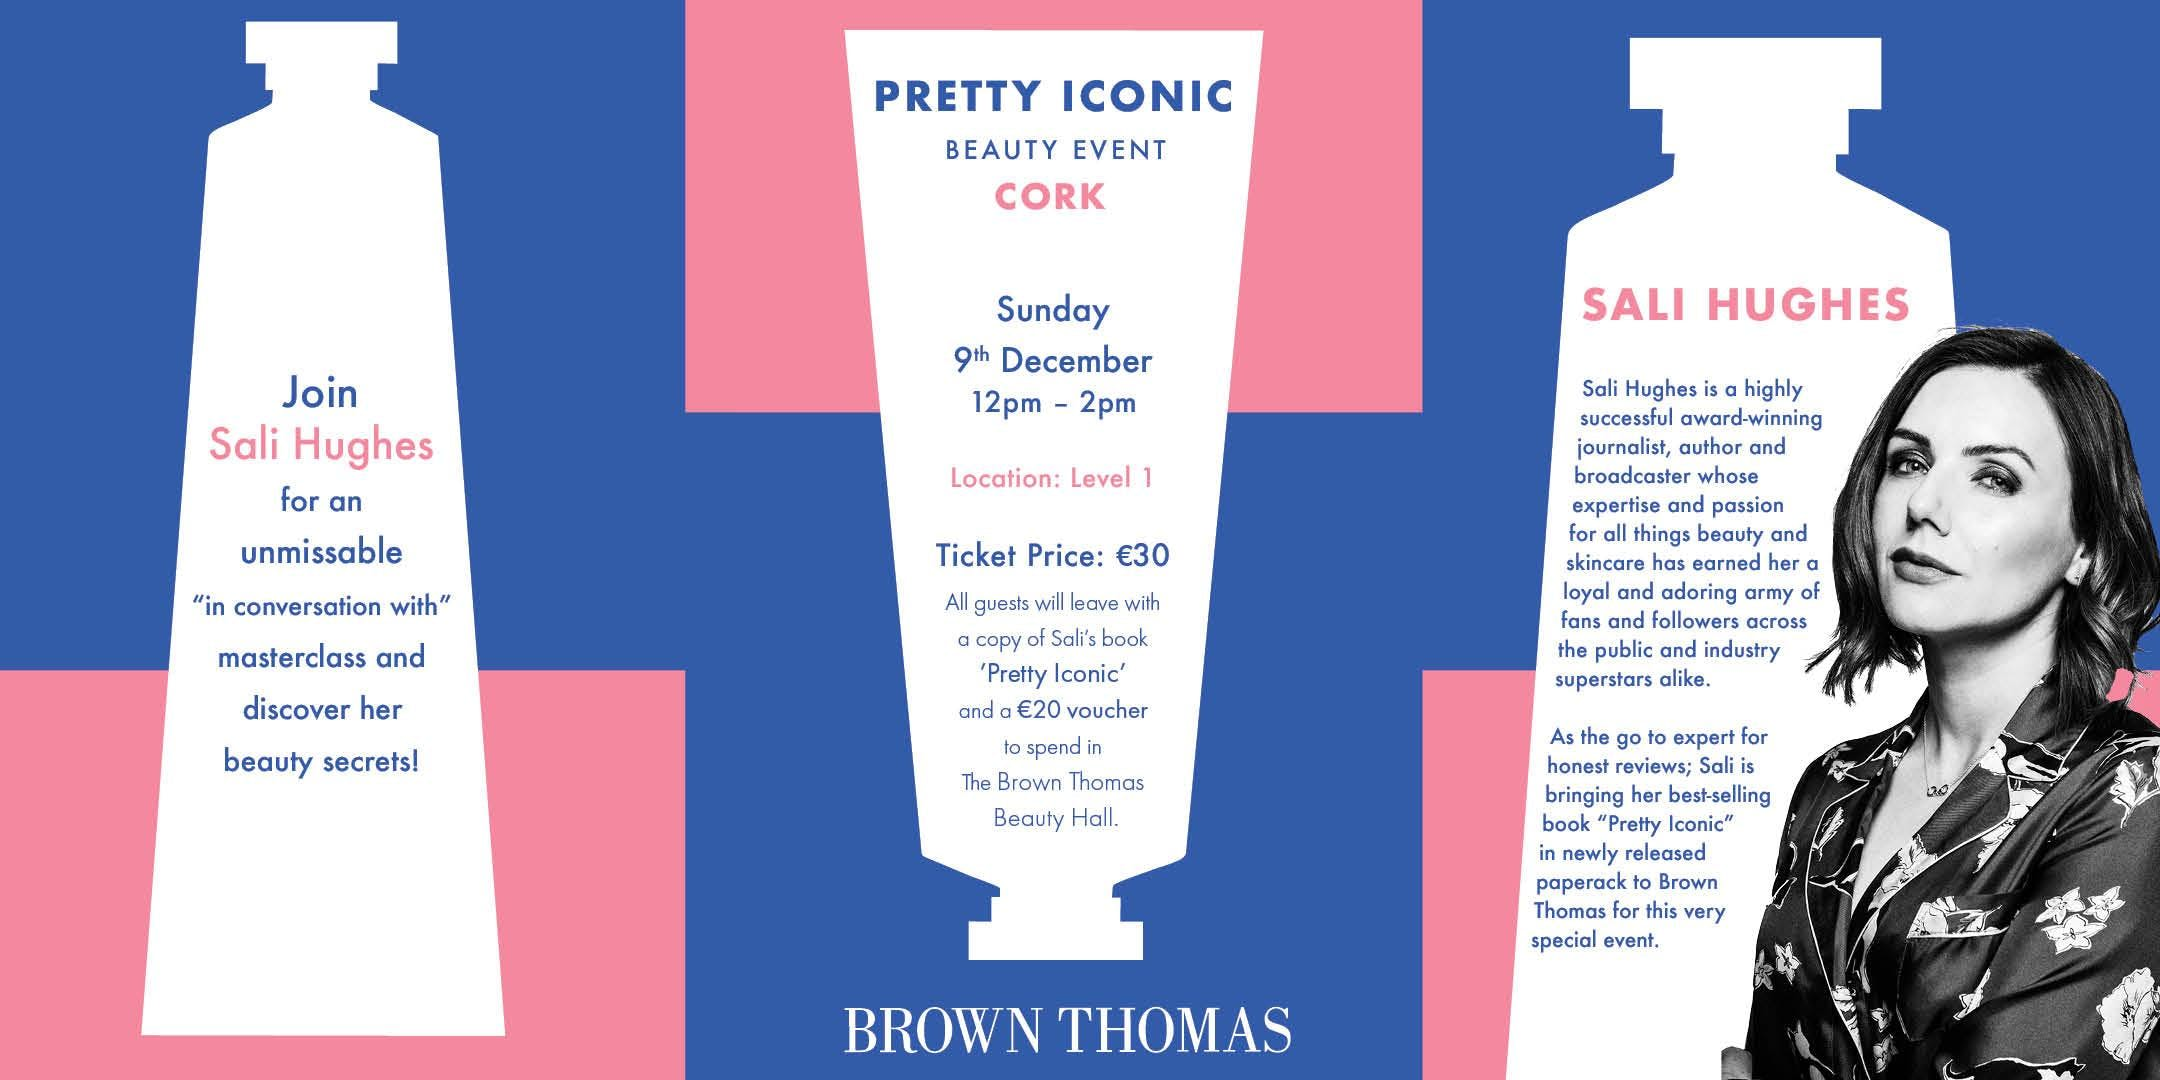 PRETTY ICONIC - Sali Hughes Beauty Masterclass Event @ Brown Thomas Cork